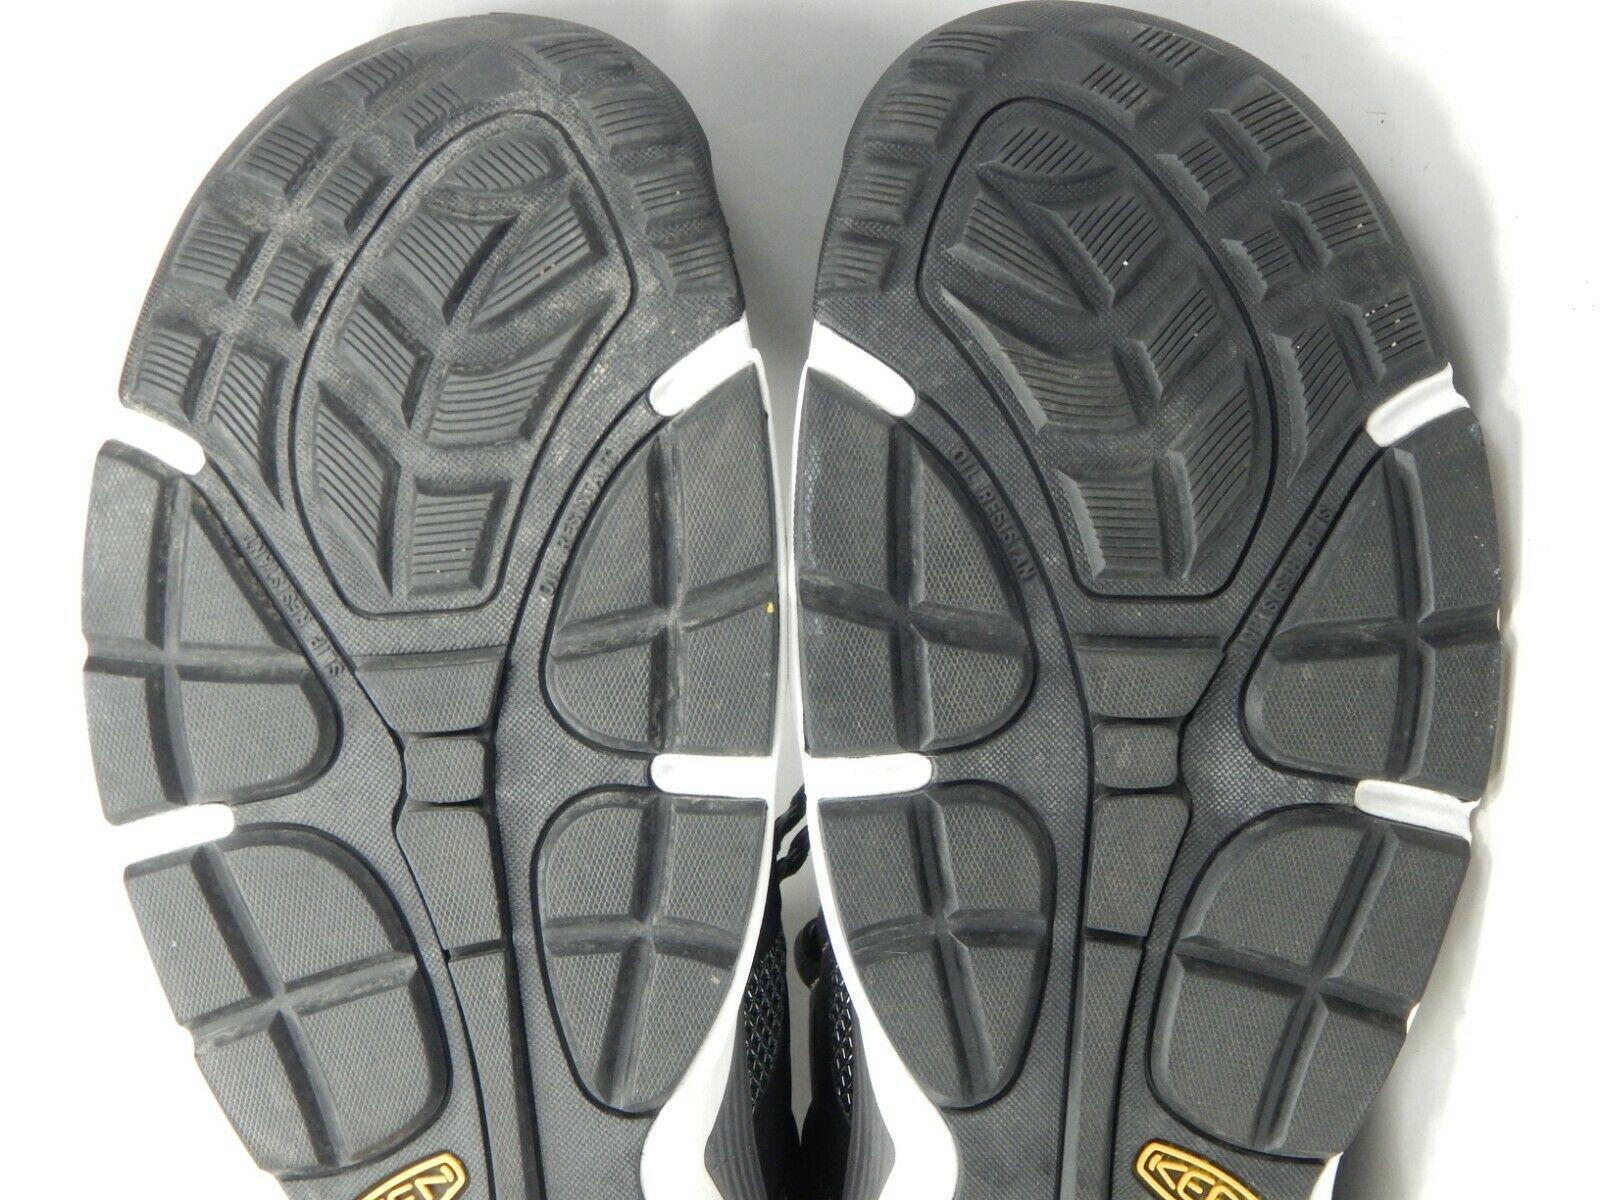 Keen San Antonio Mid Size 13 M (D) EU 47 Men's Aluminum Toe Work Shoes 1018647